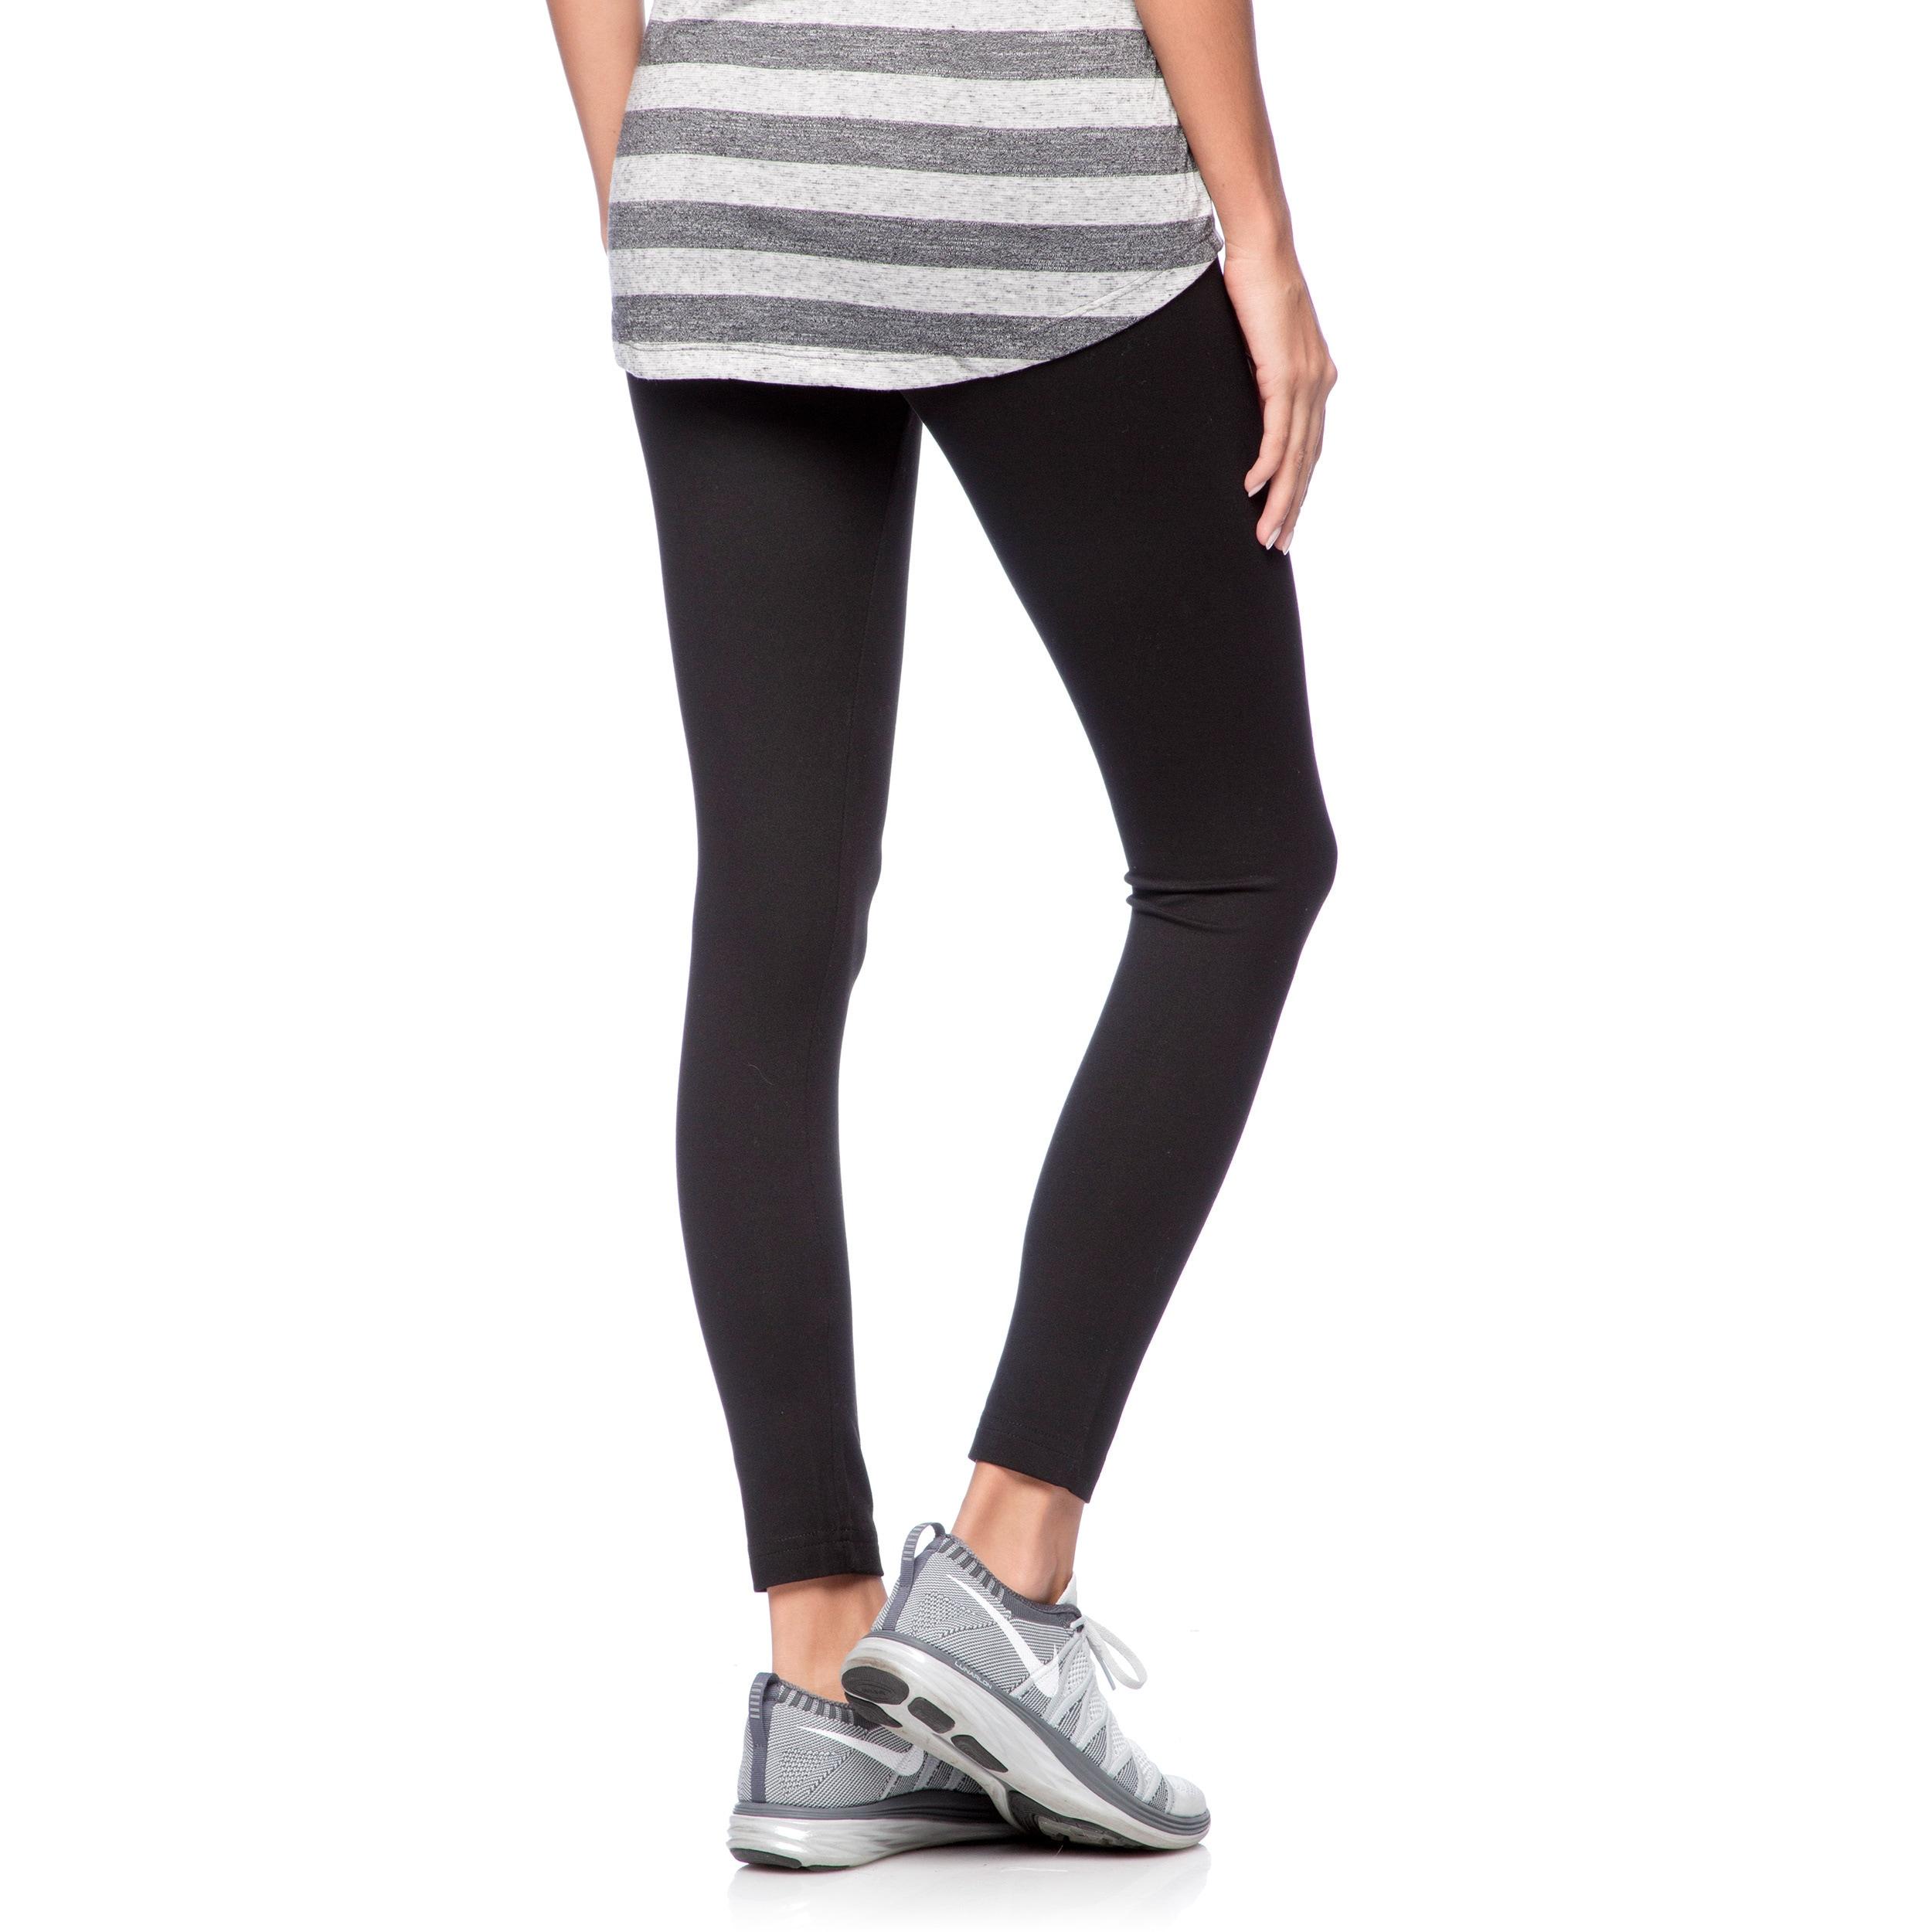 13d7afec877655 Shop Marika Sanded Dry Wik Flat Waist Legging - Free Shipping On Orders  Over $45 - Overstock - 9505618